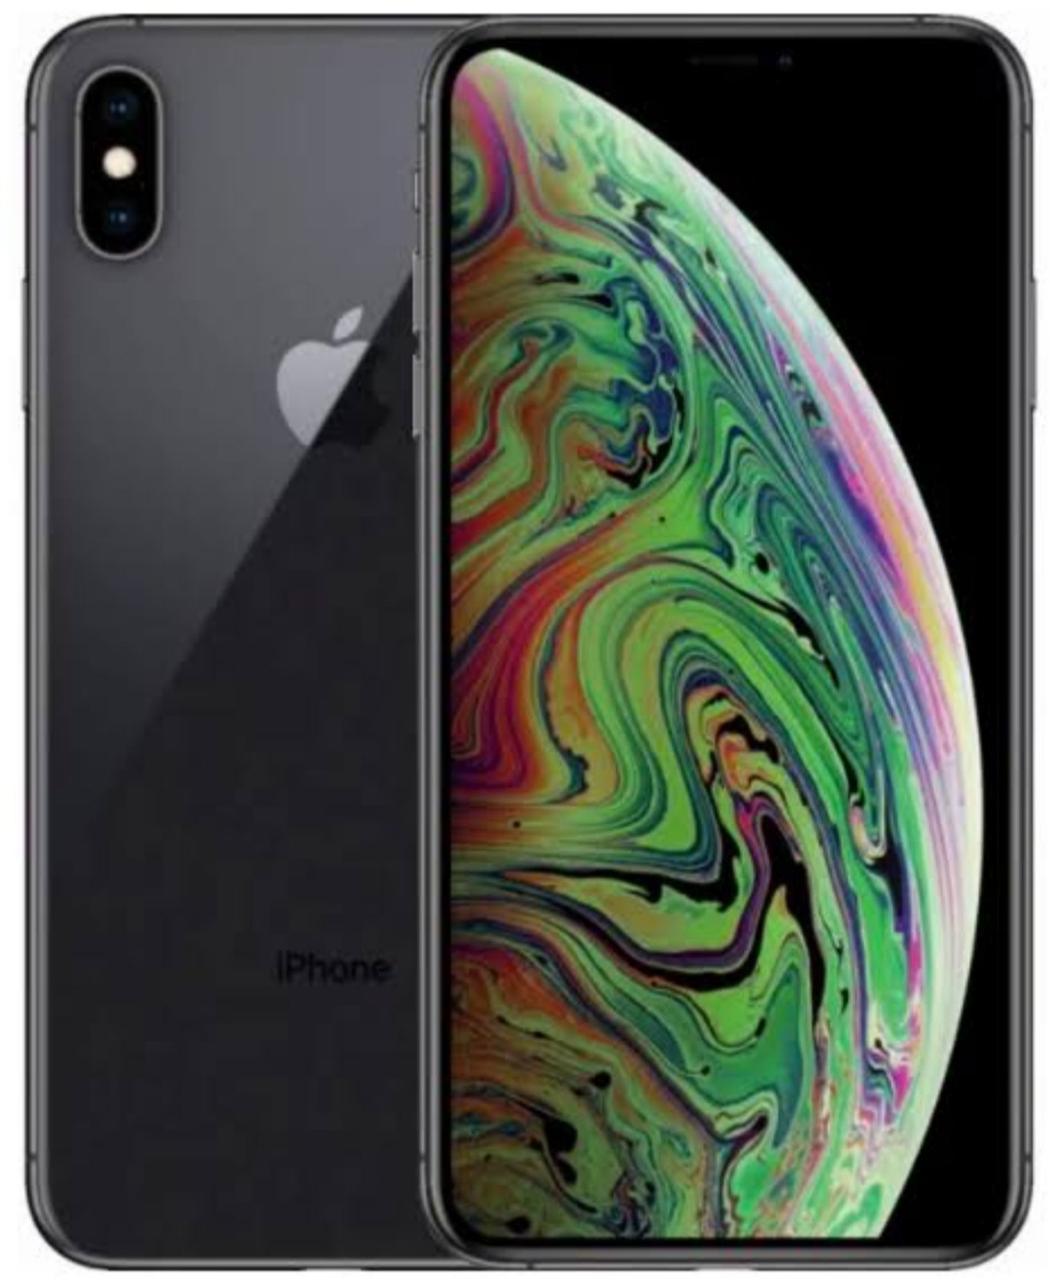 Apple iPhone XS Max 256GB Space Gray (MT532) Refurbished